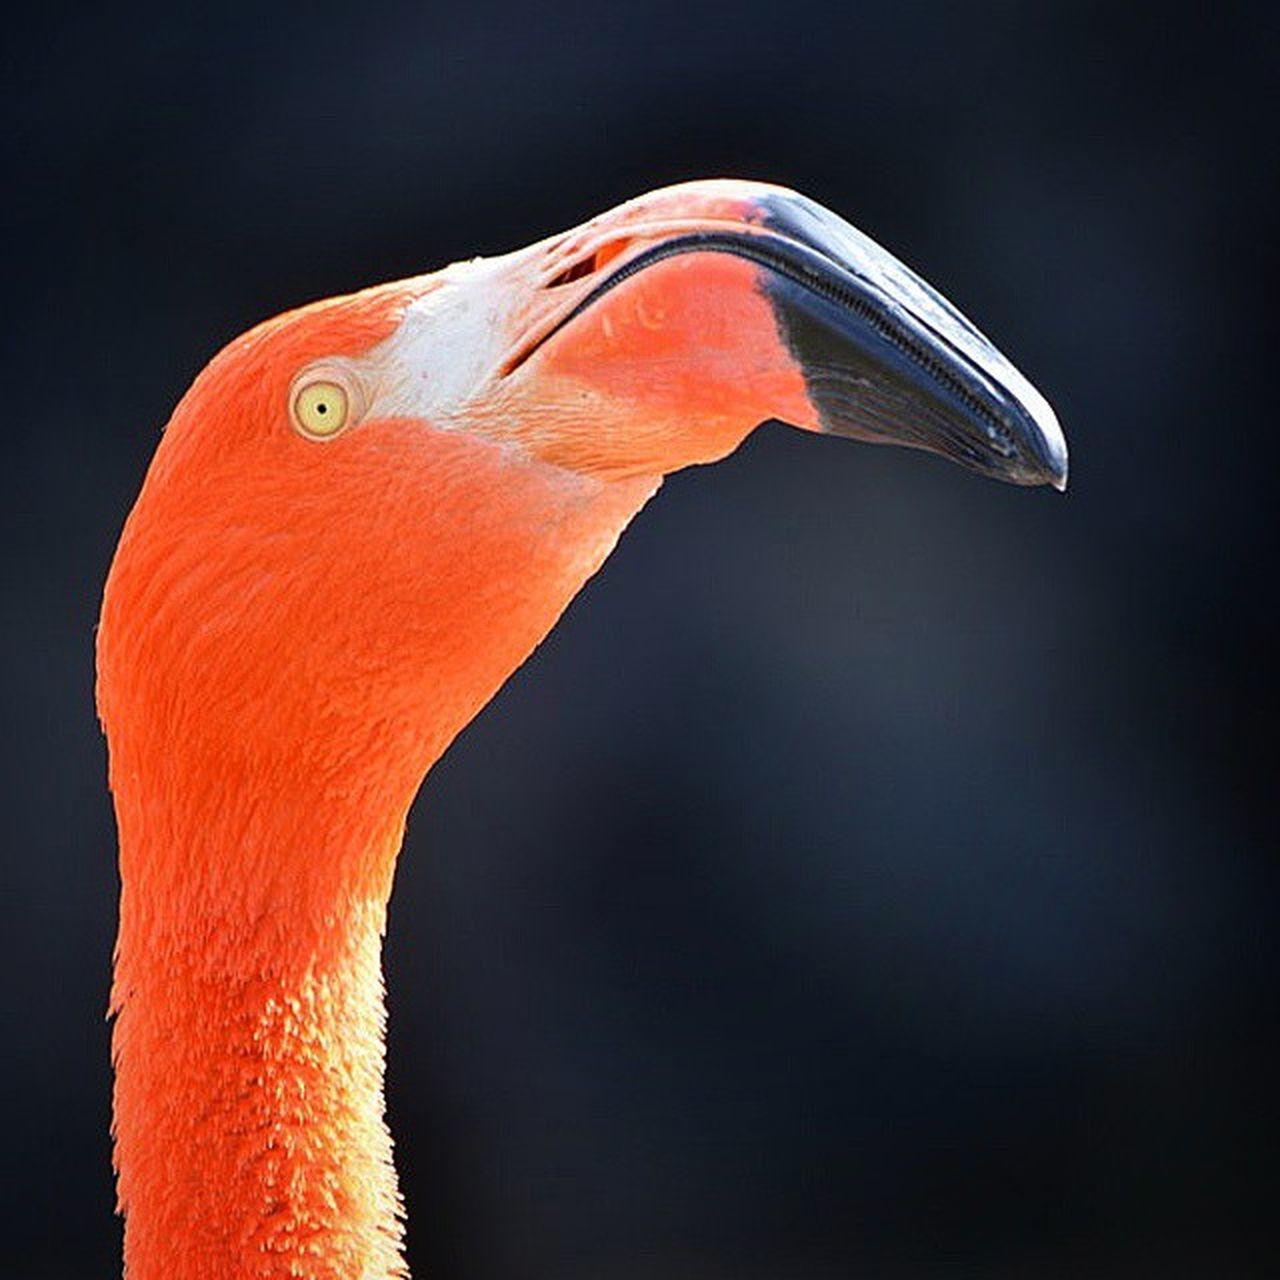 Flamenco Bioparque Temaiken Retrato Animal aves Argentina colorful colores portrait